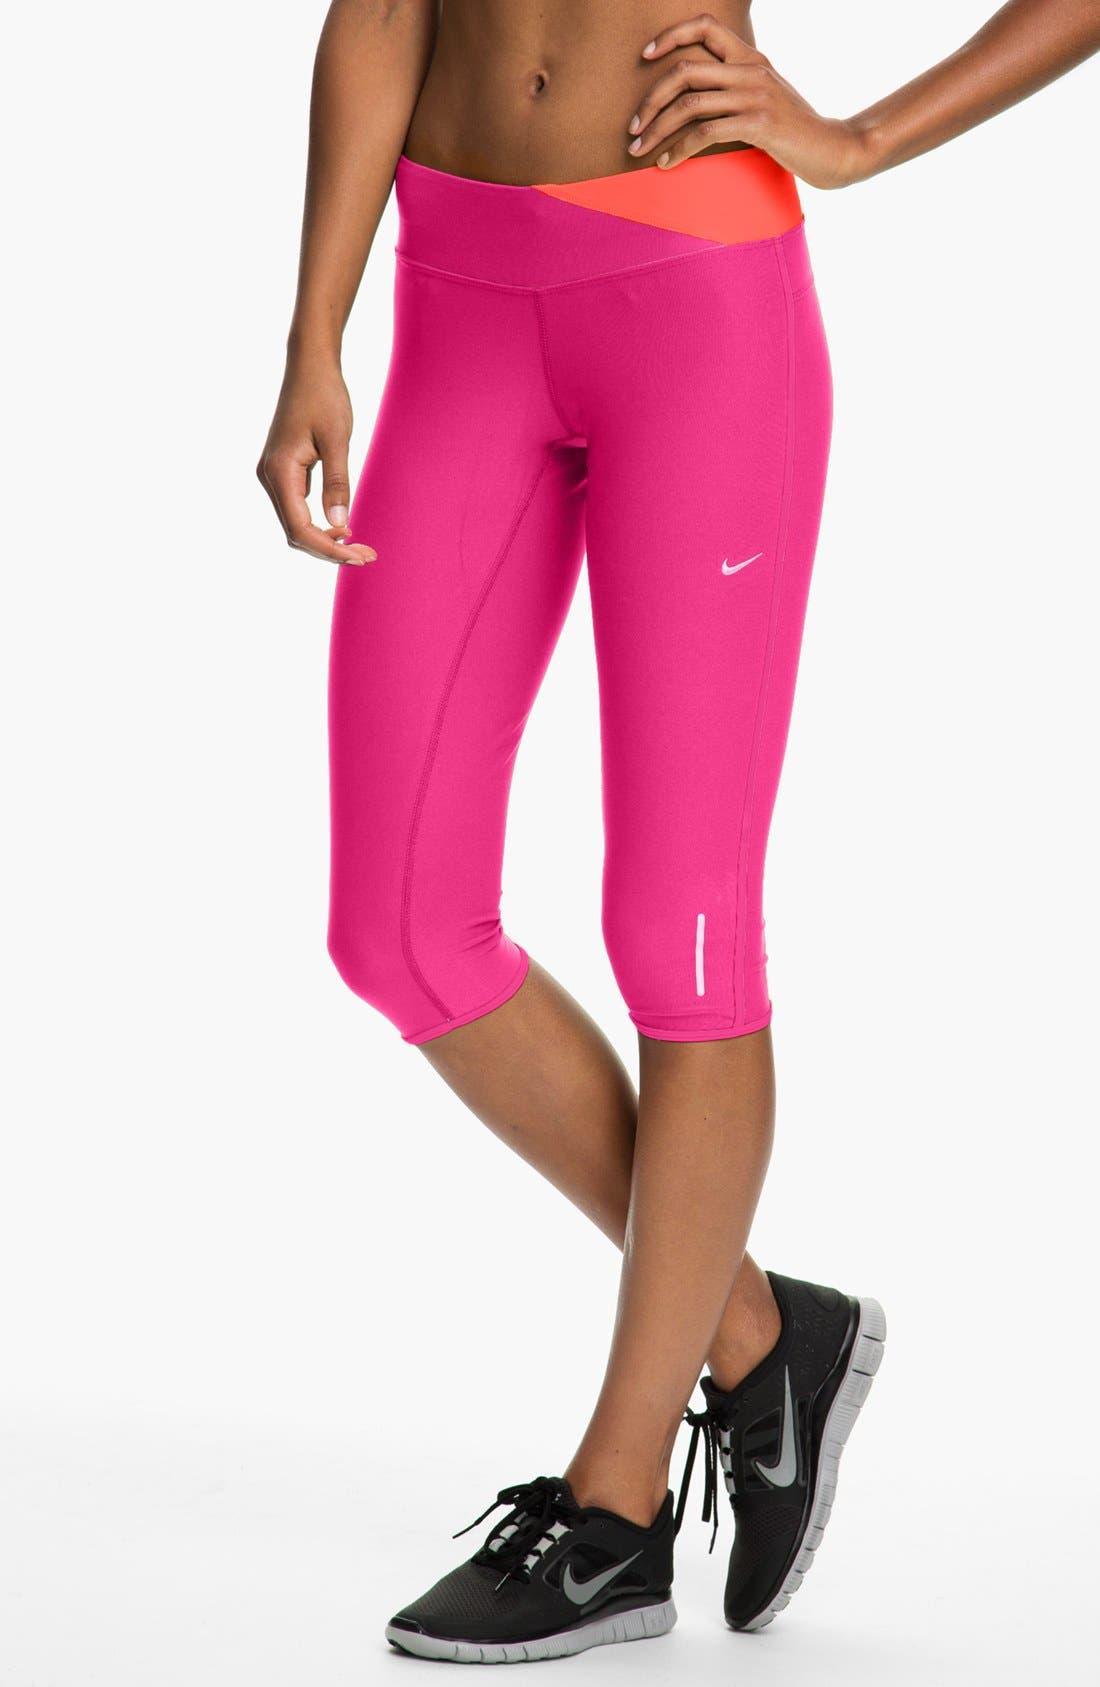 Main Image - Nike 'Twisted' Running Capris